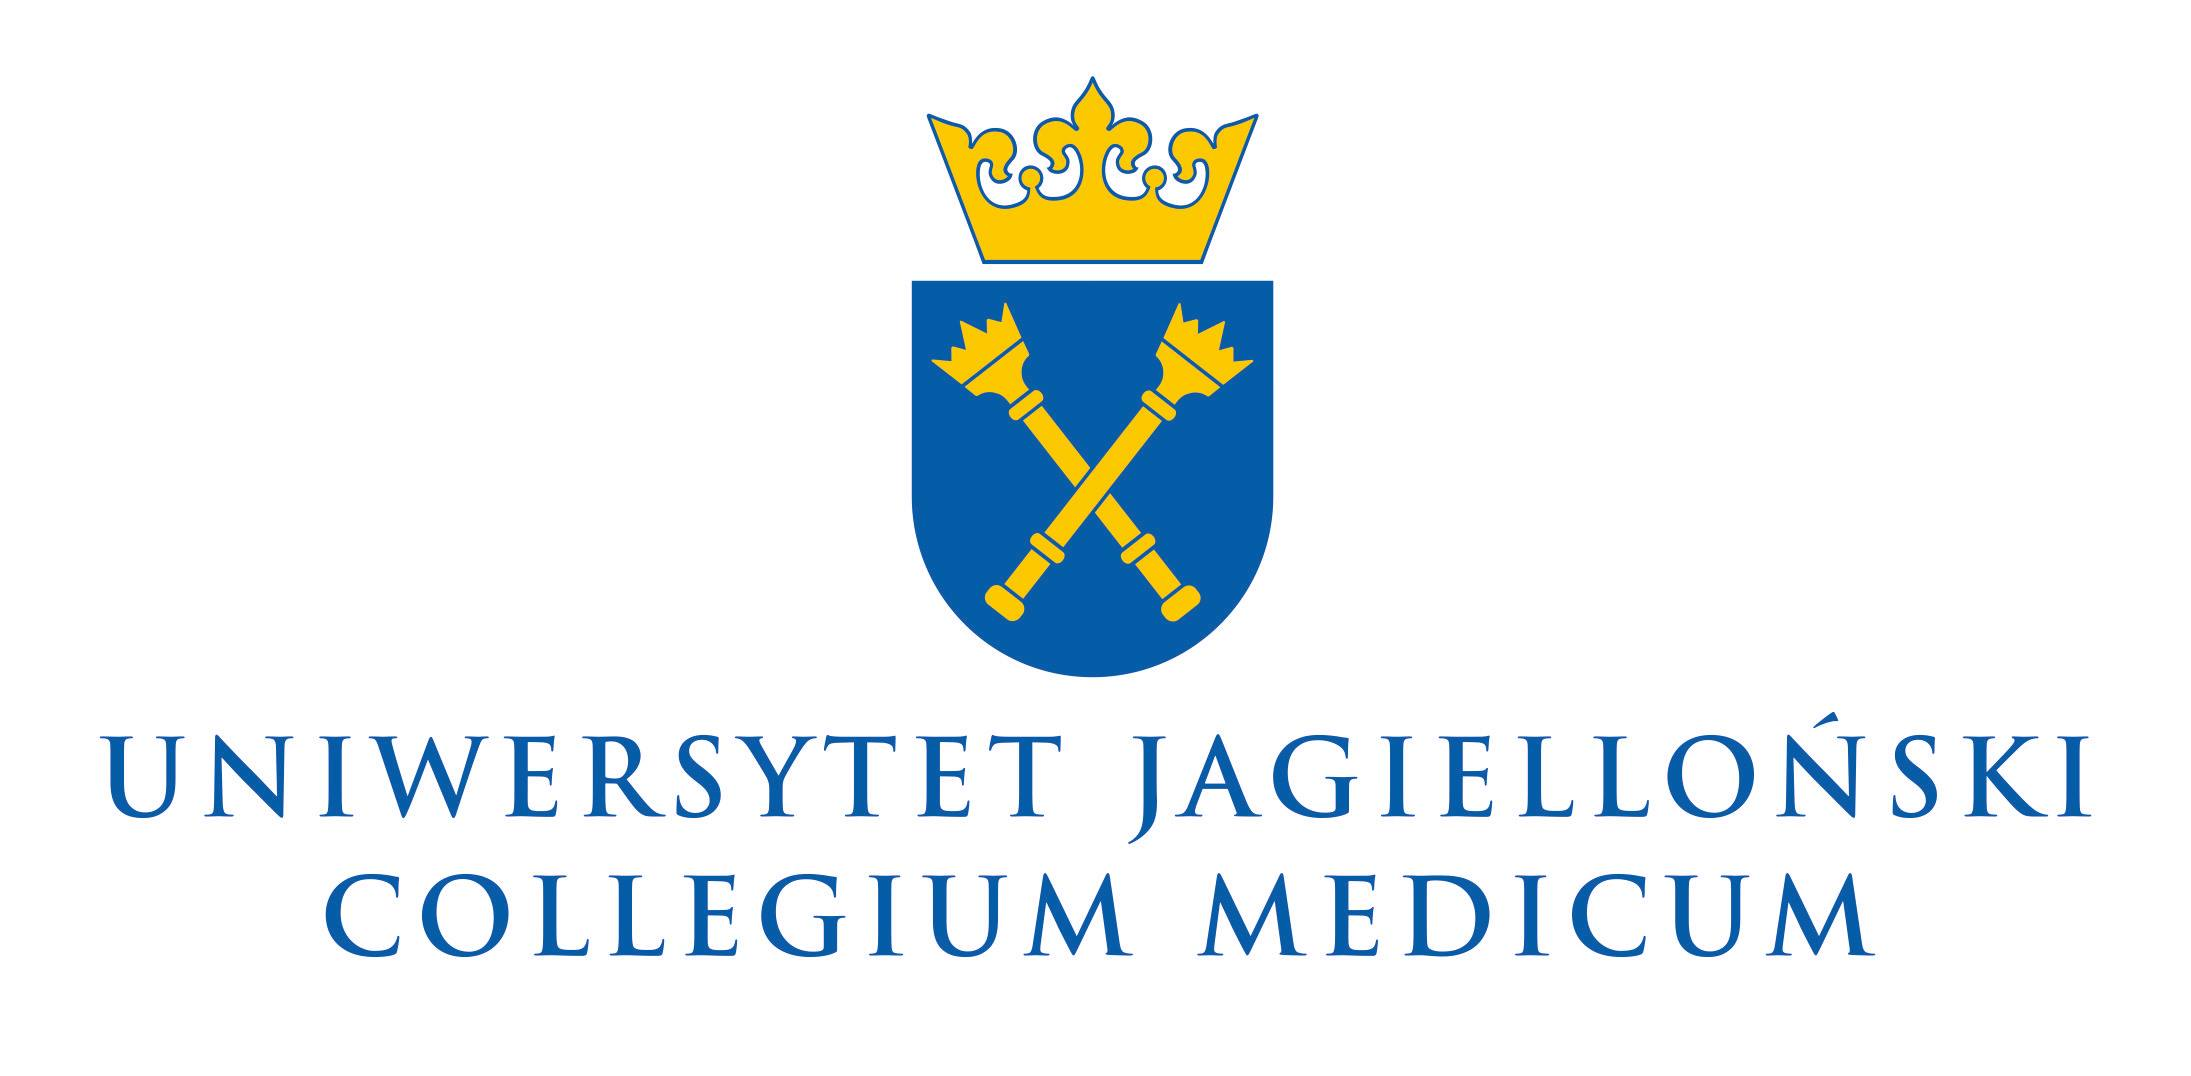 Uniwersytet Jagielloński Collegium Medicum objął nas swoim patronatem